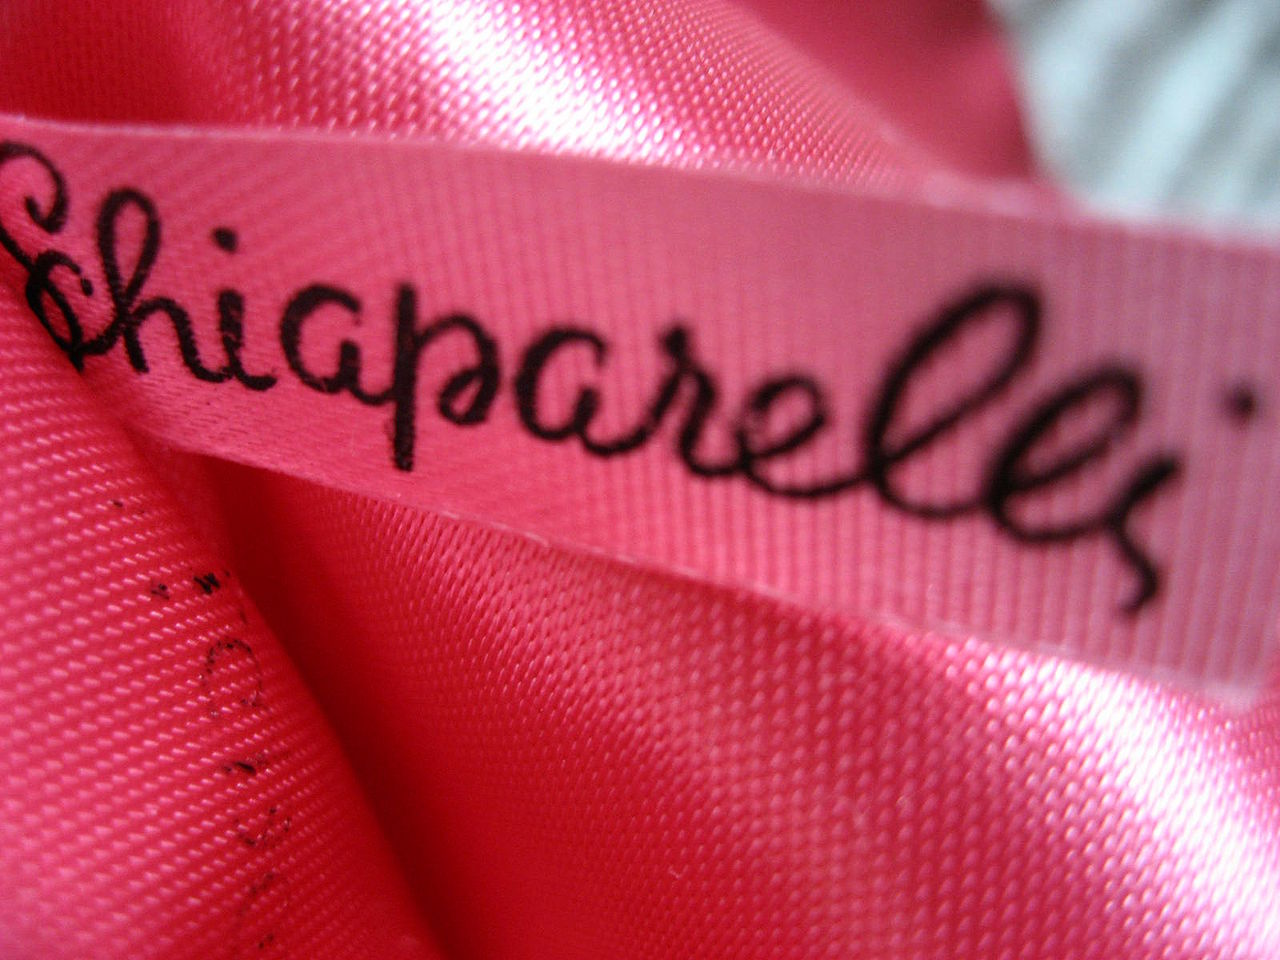 Schiaparelli Fashion Brand